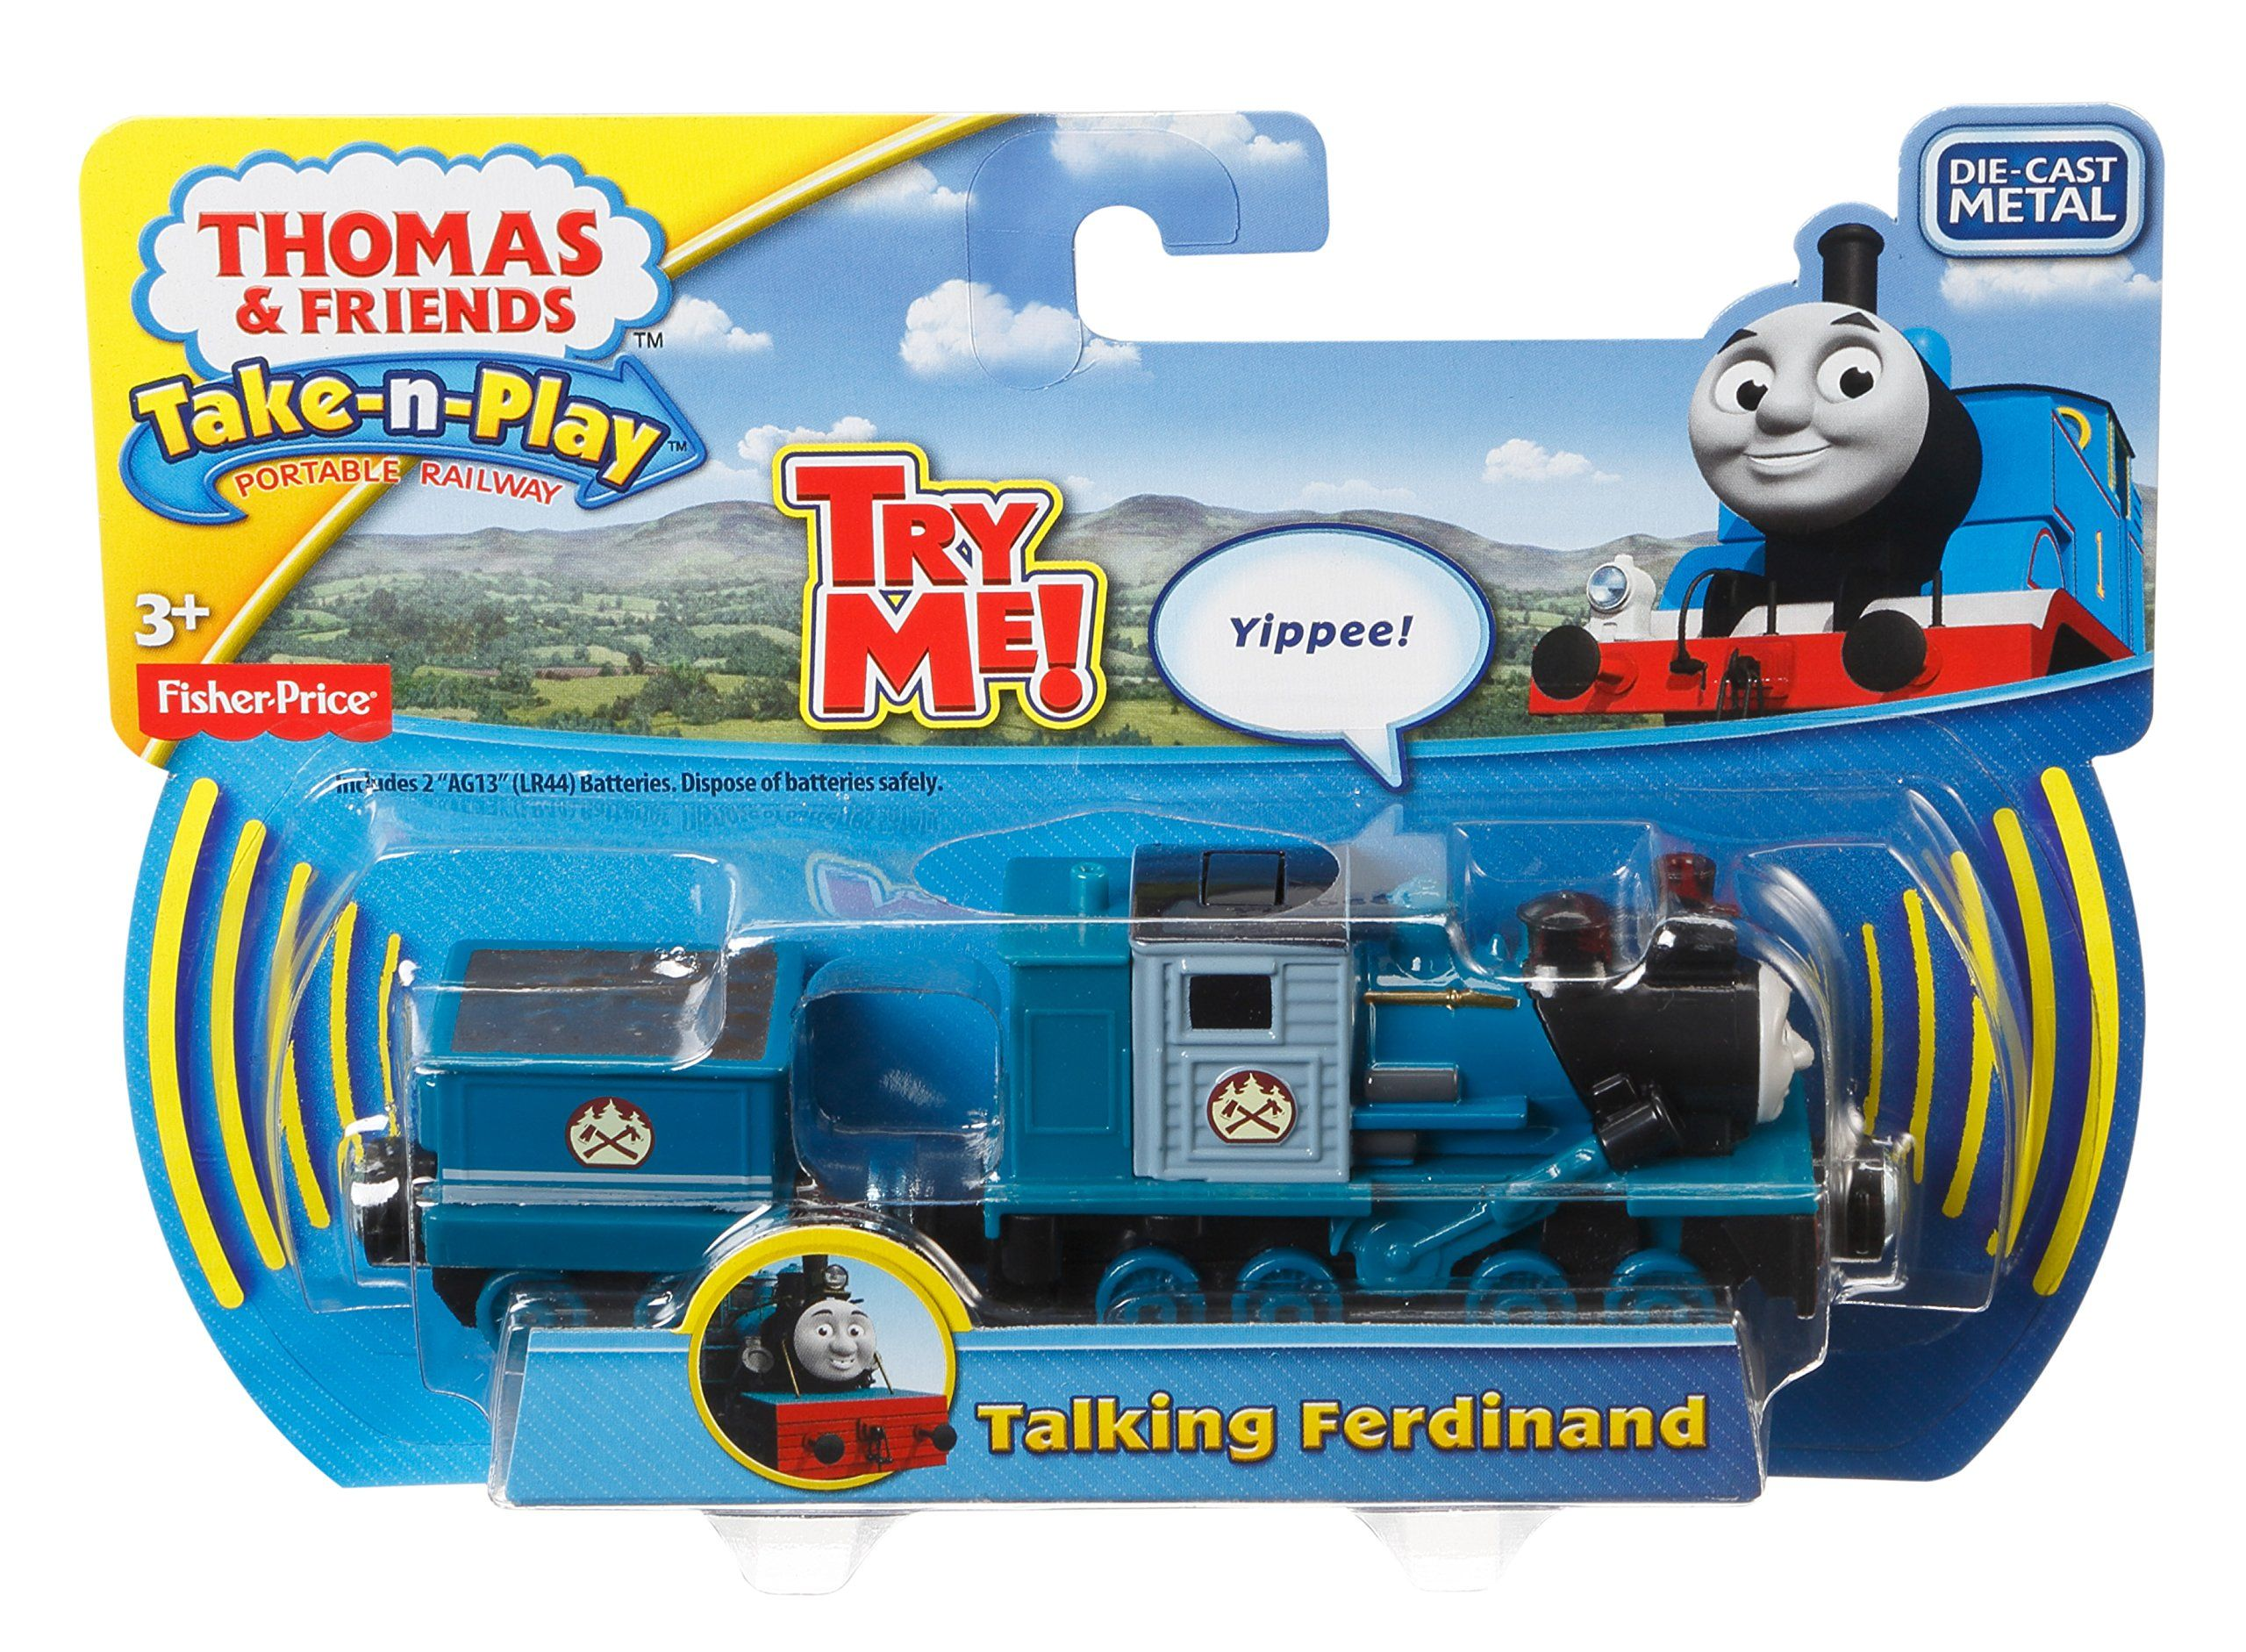 Fisher-Price Thomas & Friends Take-n-Play Talking Ferdinand Toy ...